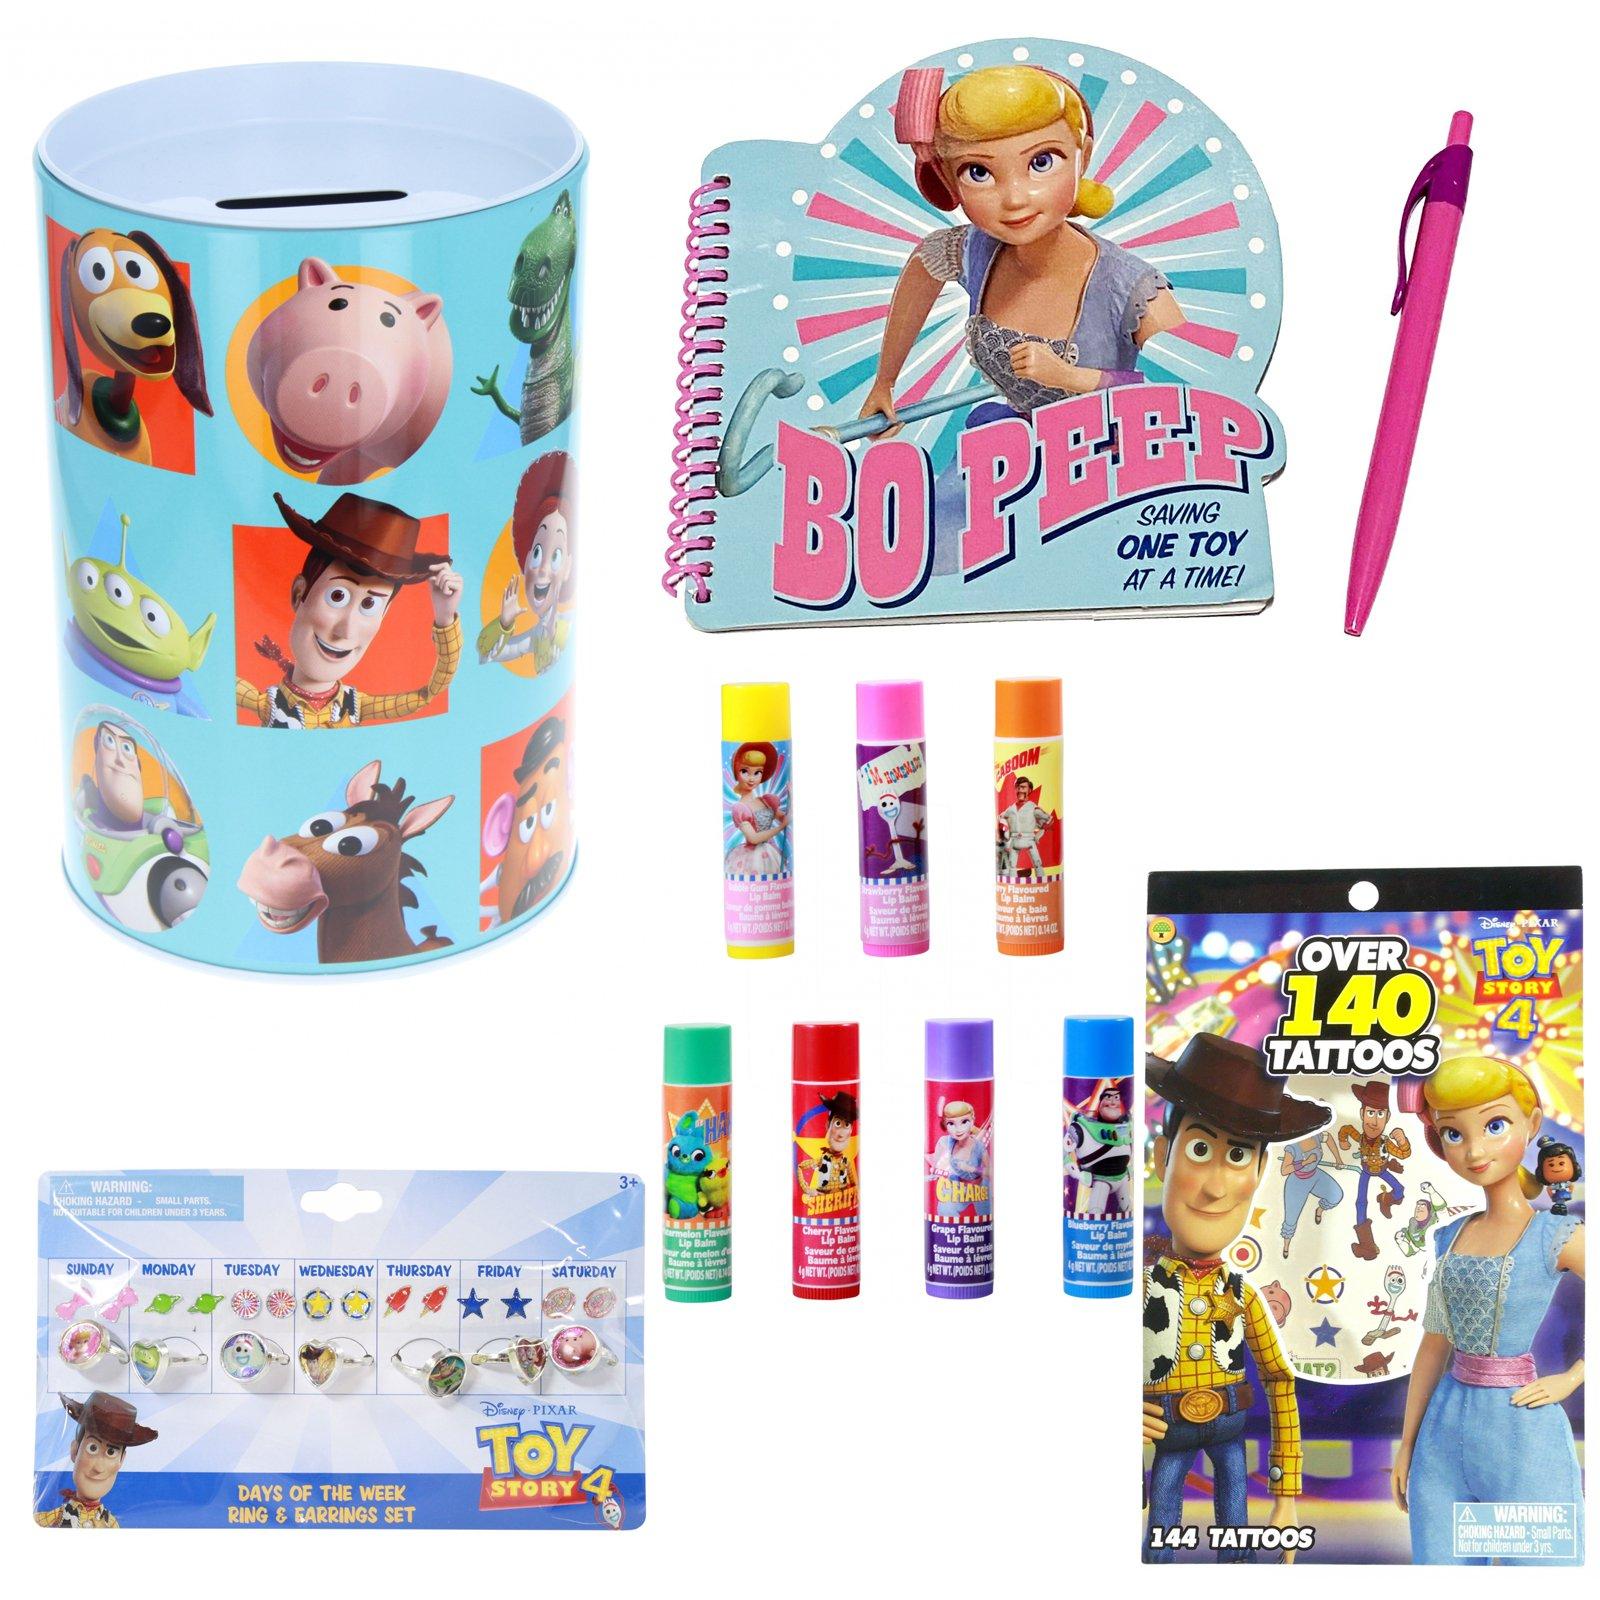 Disney Toy Story 4 Kids Tin Piggy Bank Learning Savings